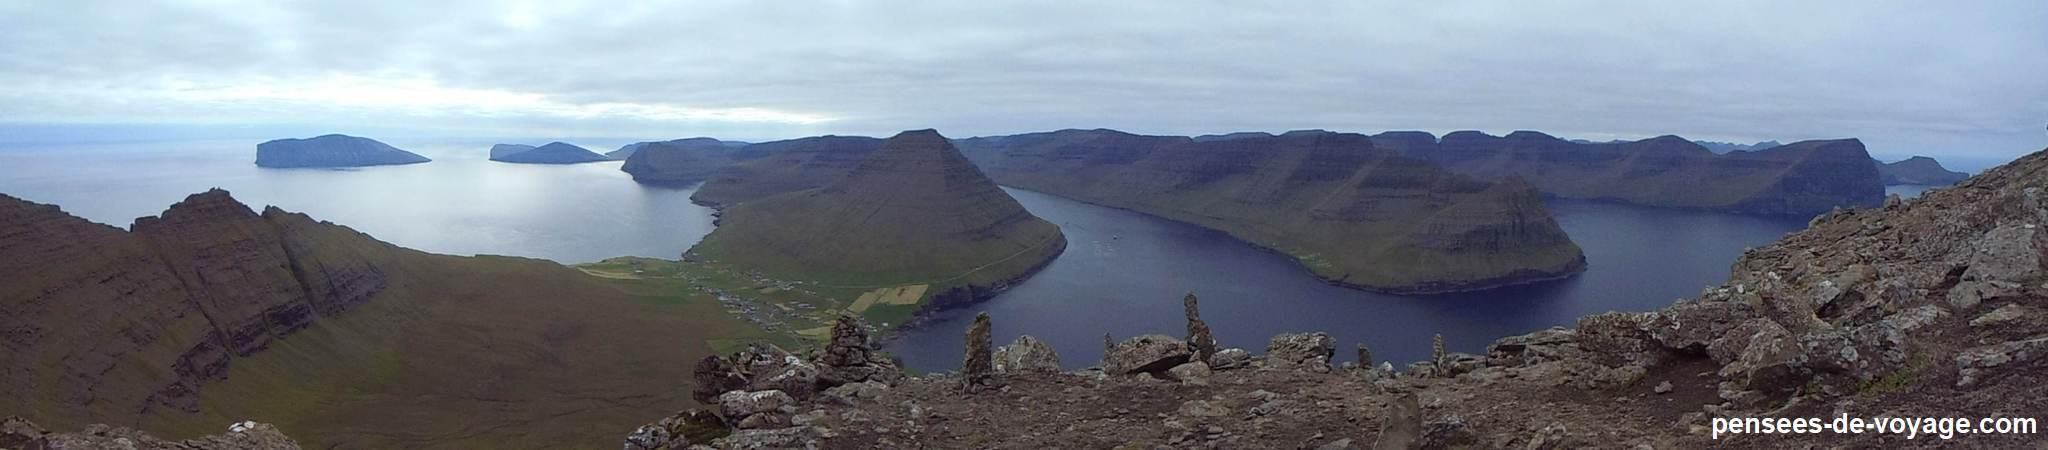 Vue panoramique sommet randonnee Feroe